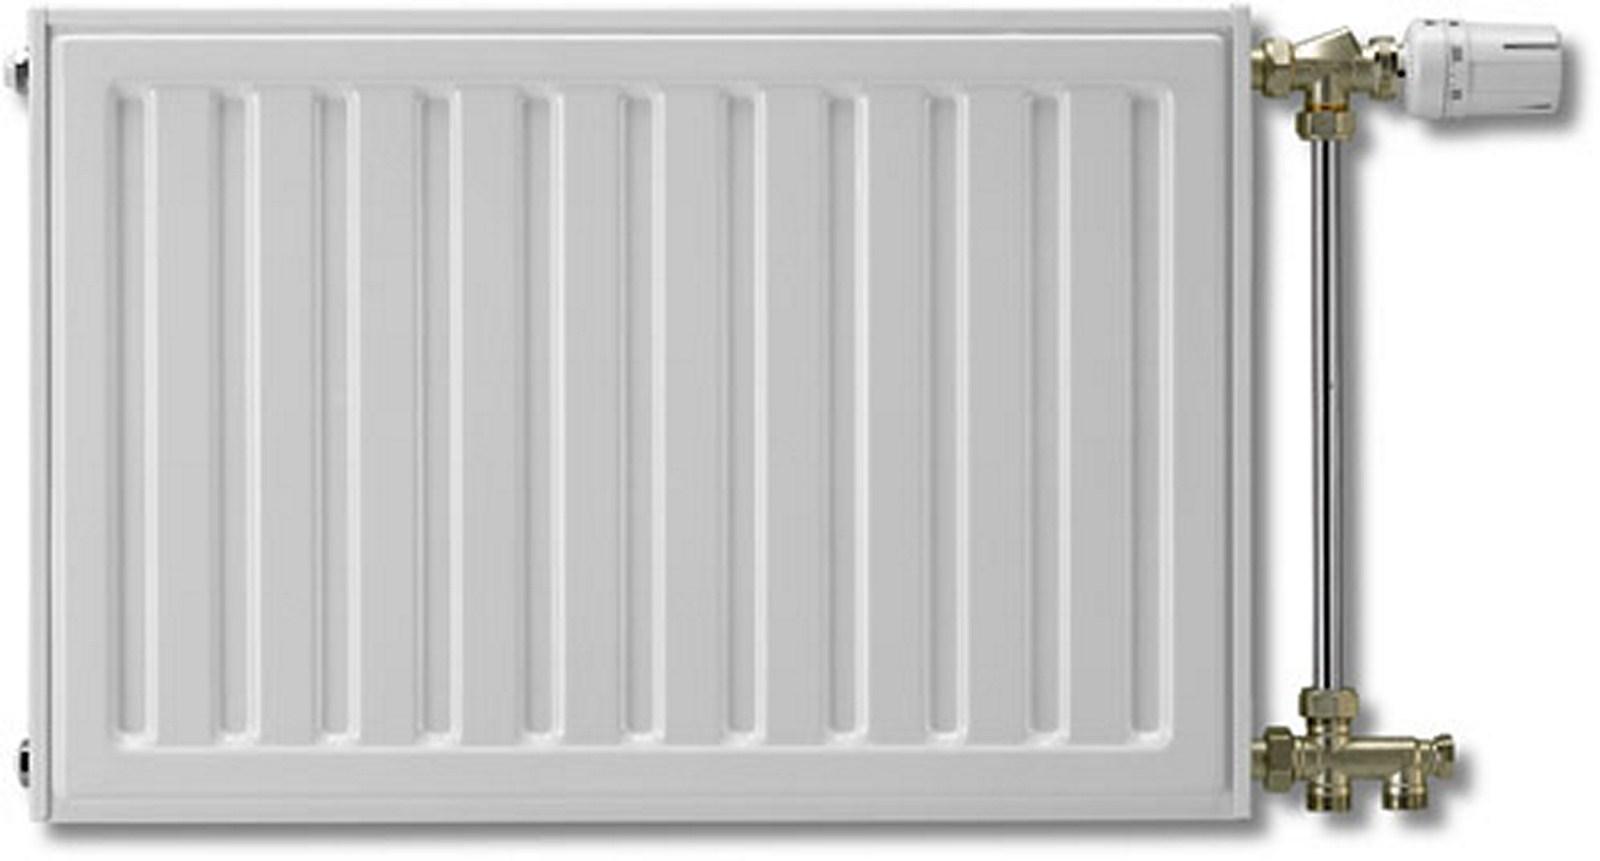 chauffage radiateur panneaux radson radiateur compact habill ep106mm 1924w 274 80 ttc. Black Bedroom Furniture Sets. Home Design Ideas